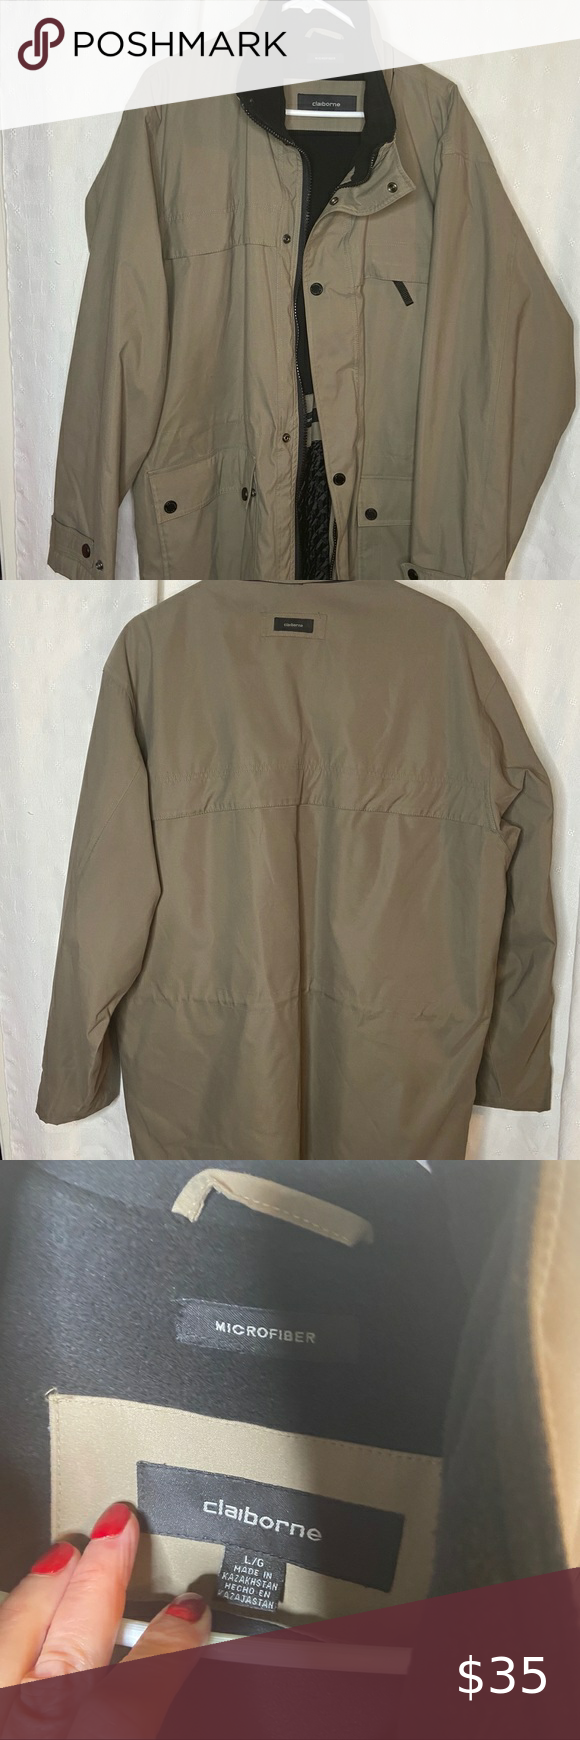 Liz Claiborne Microfiber Men S Jacket In 2021 Liz Claiborne Jackets Claiborne [ 1740 x 580 Pixel ]